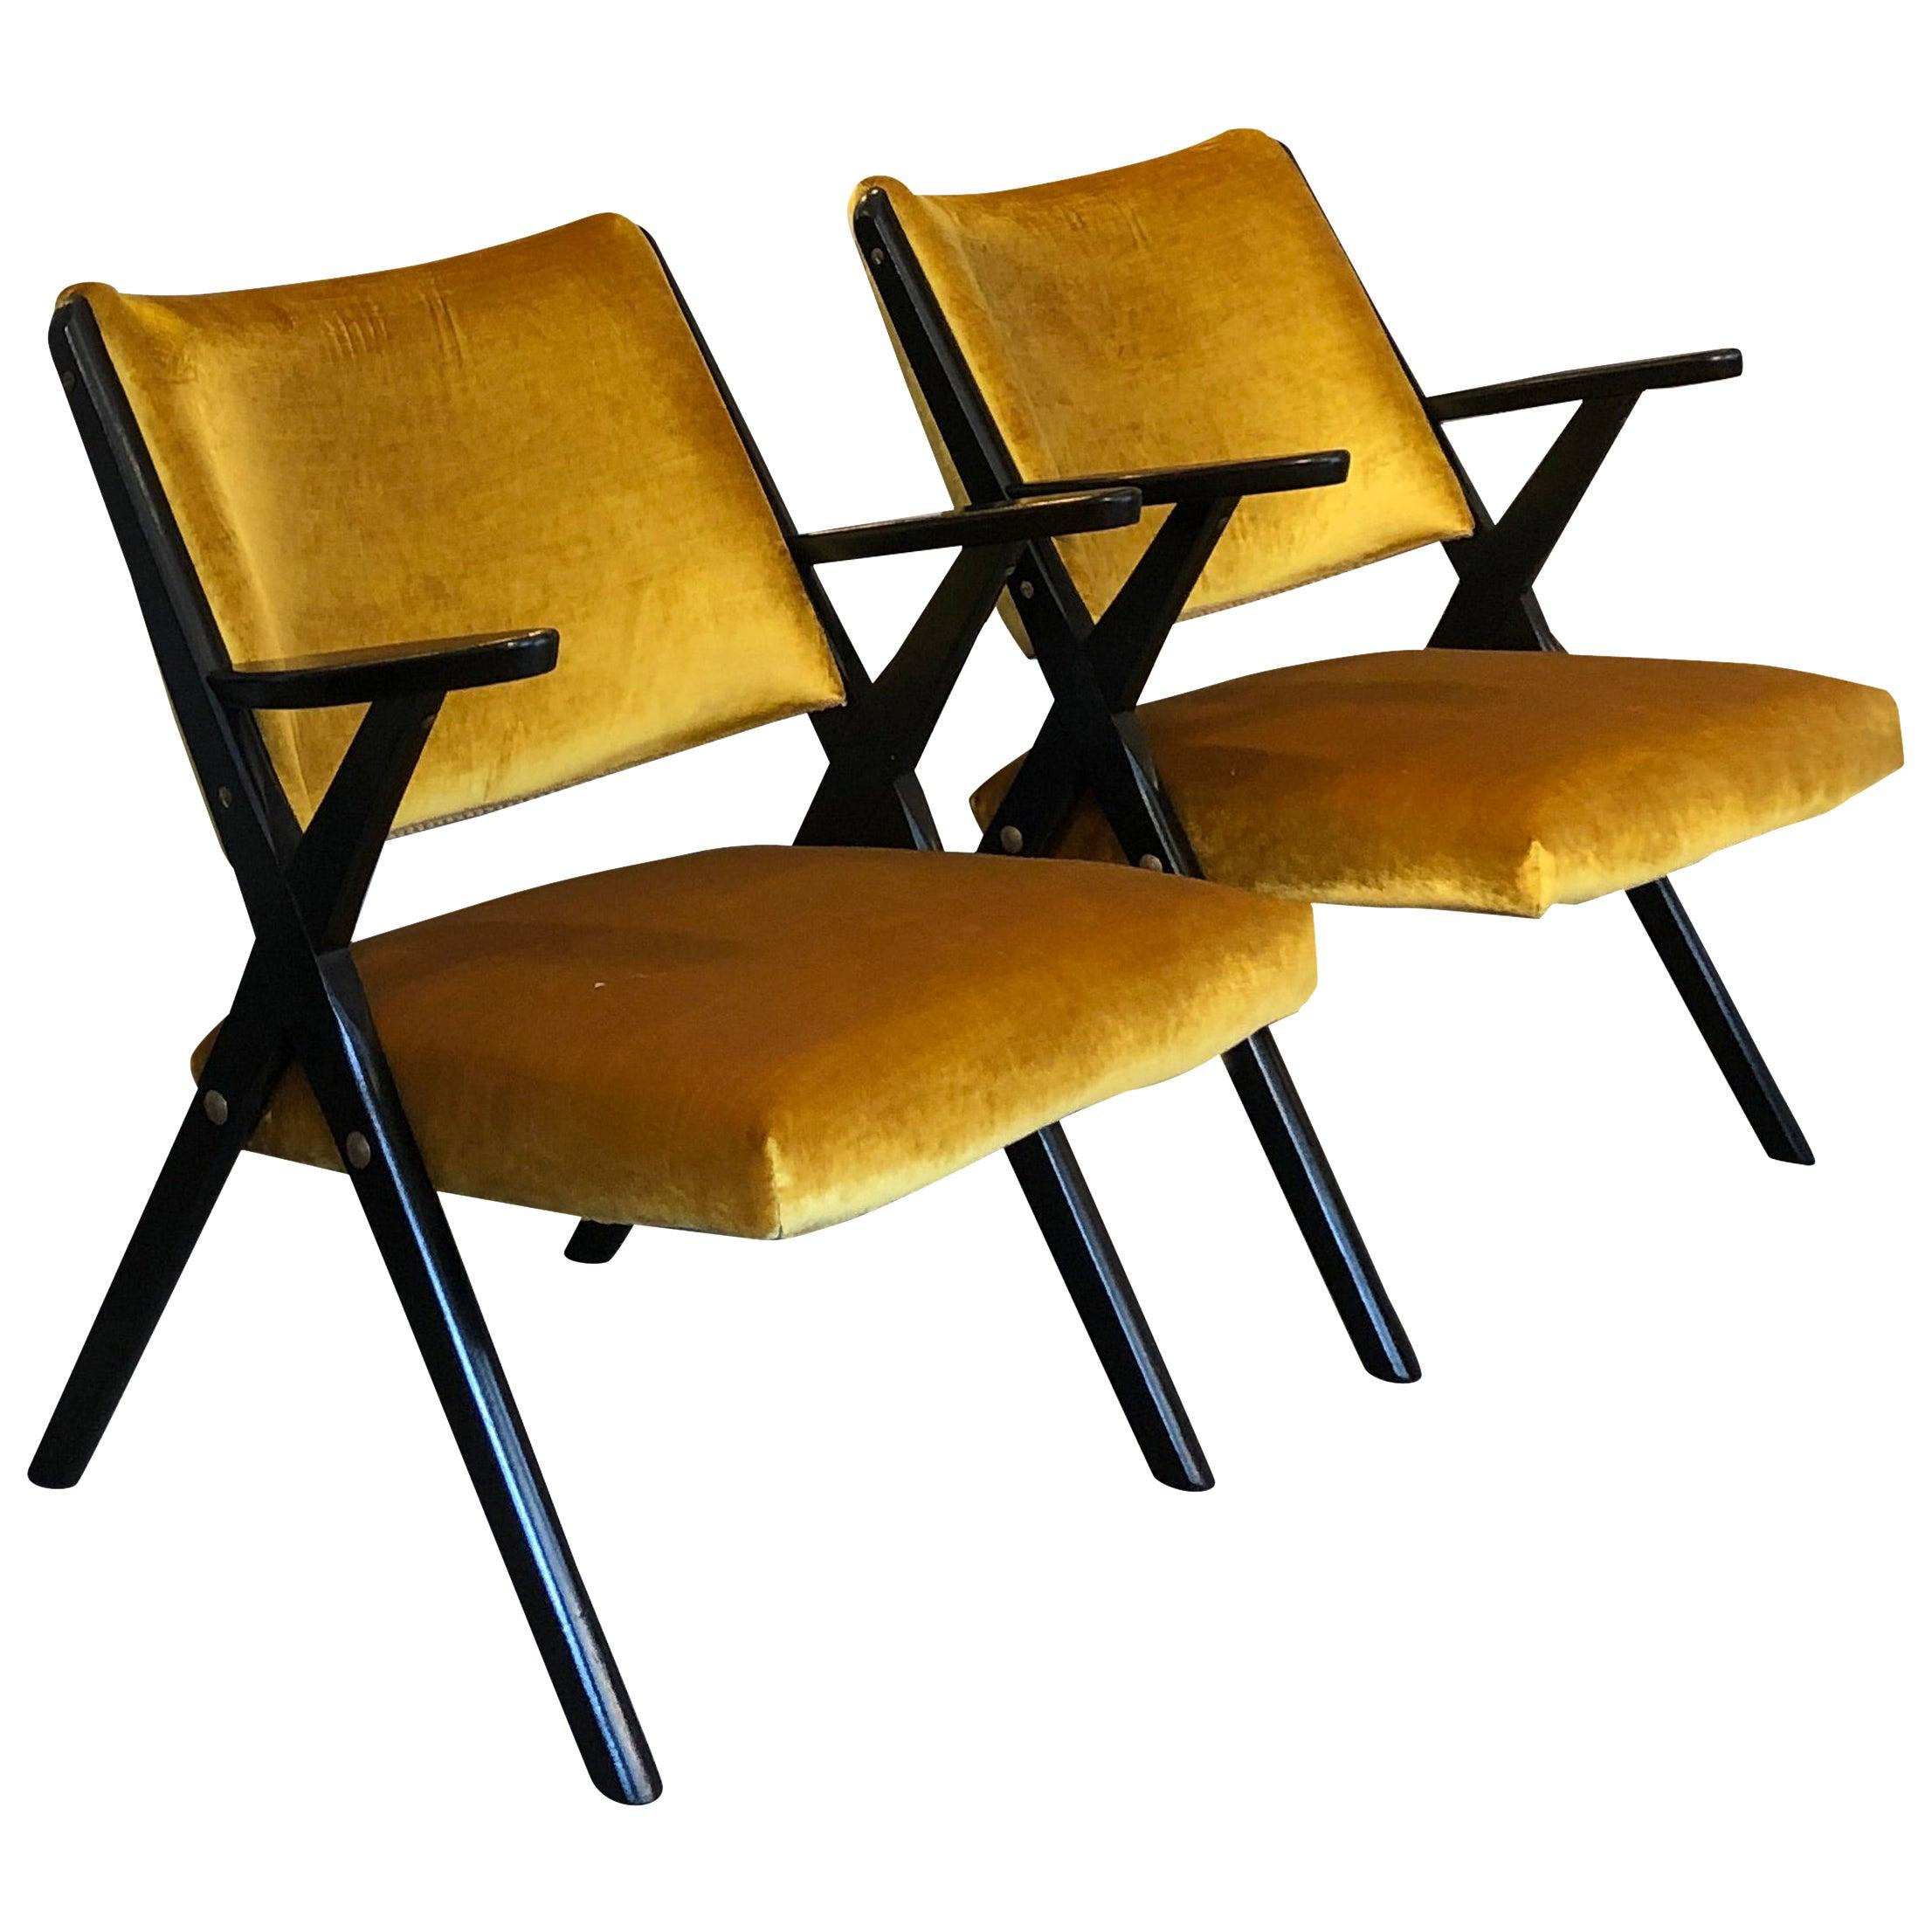 Midcentury Italian Black Lacquered Wood Ochre Velvet Armchairs by Dal Vera